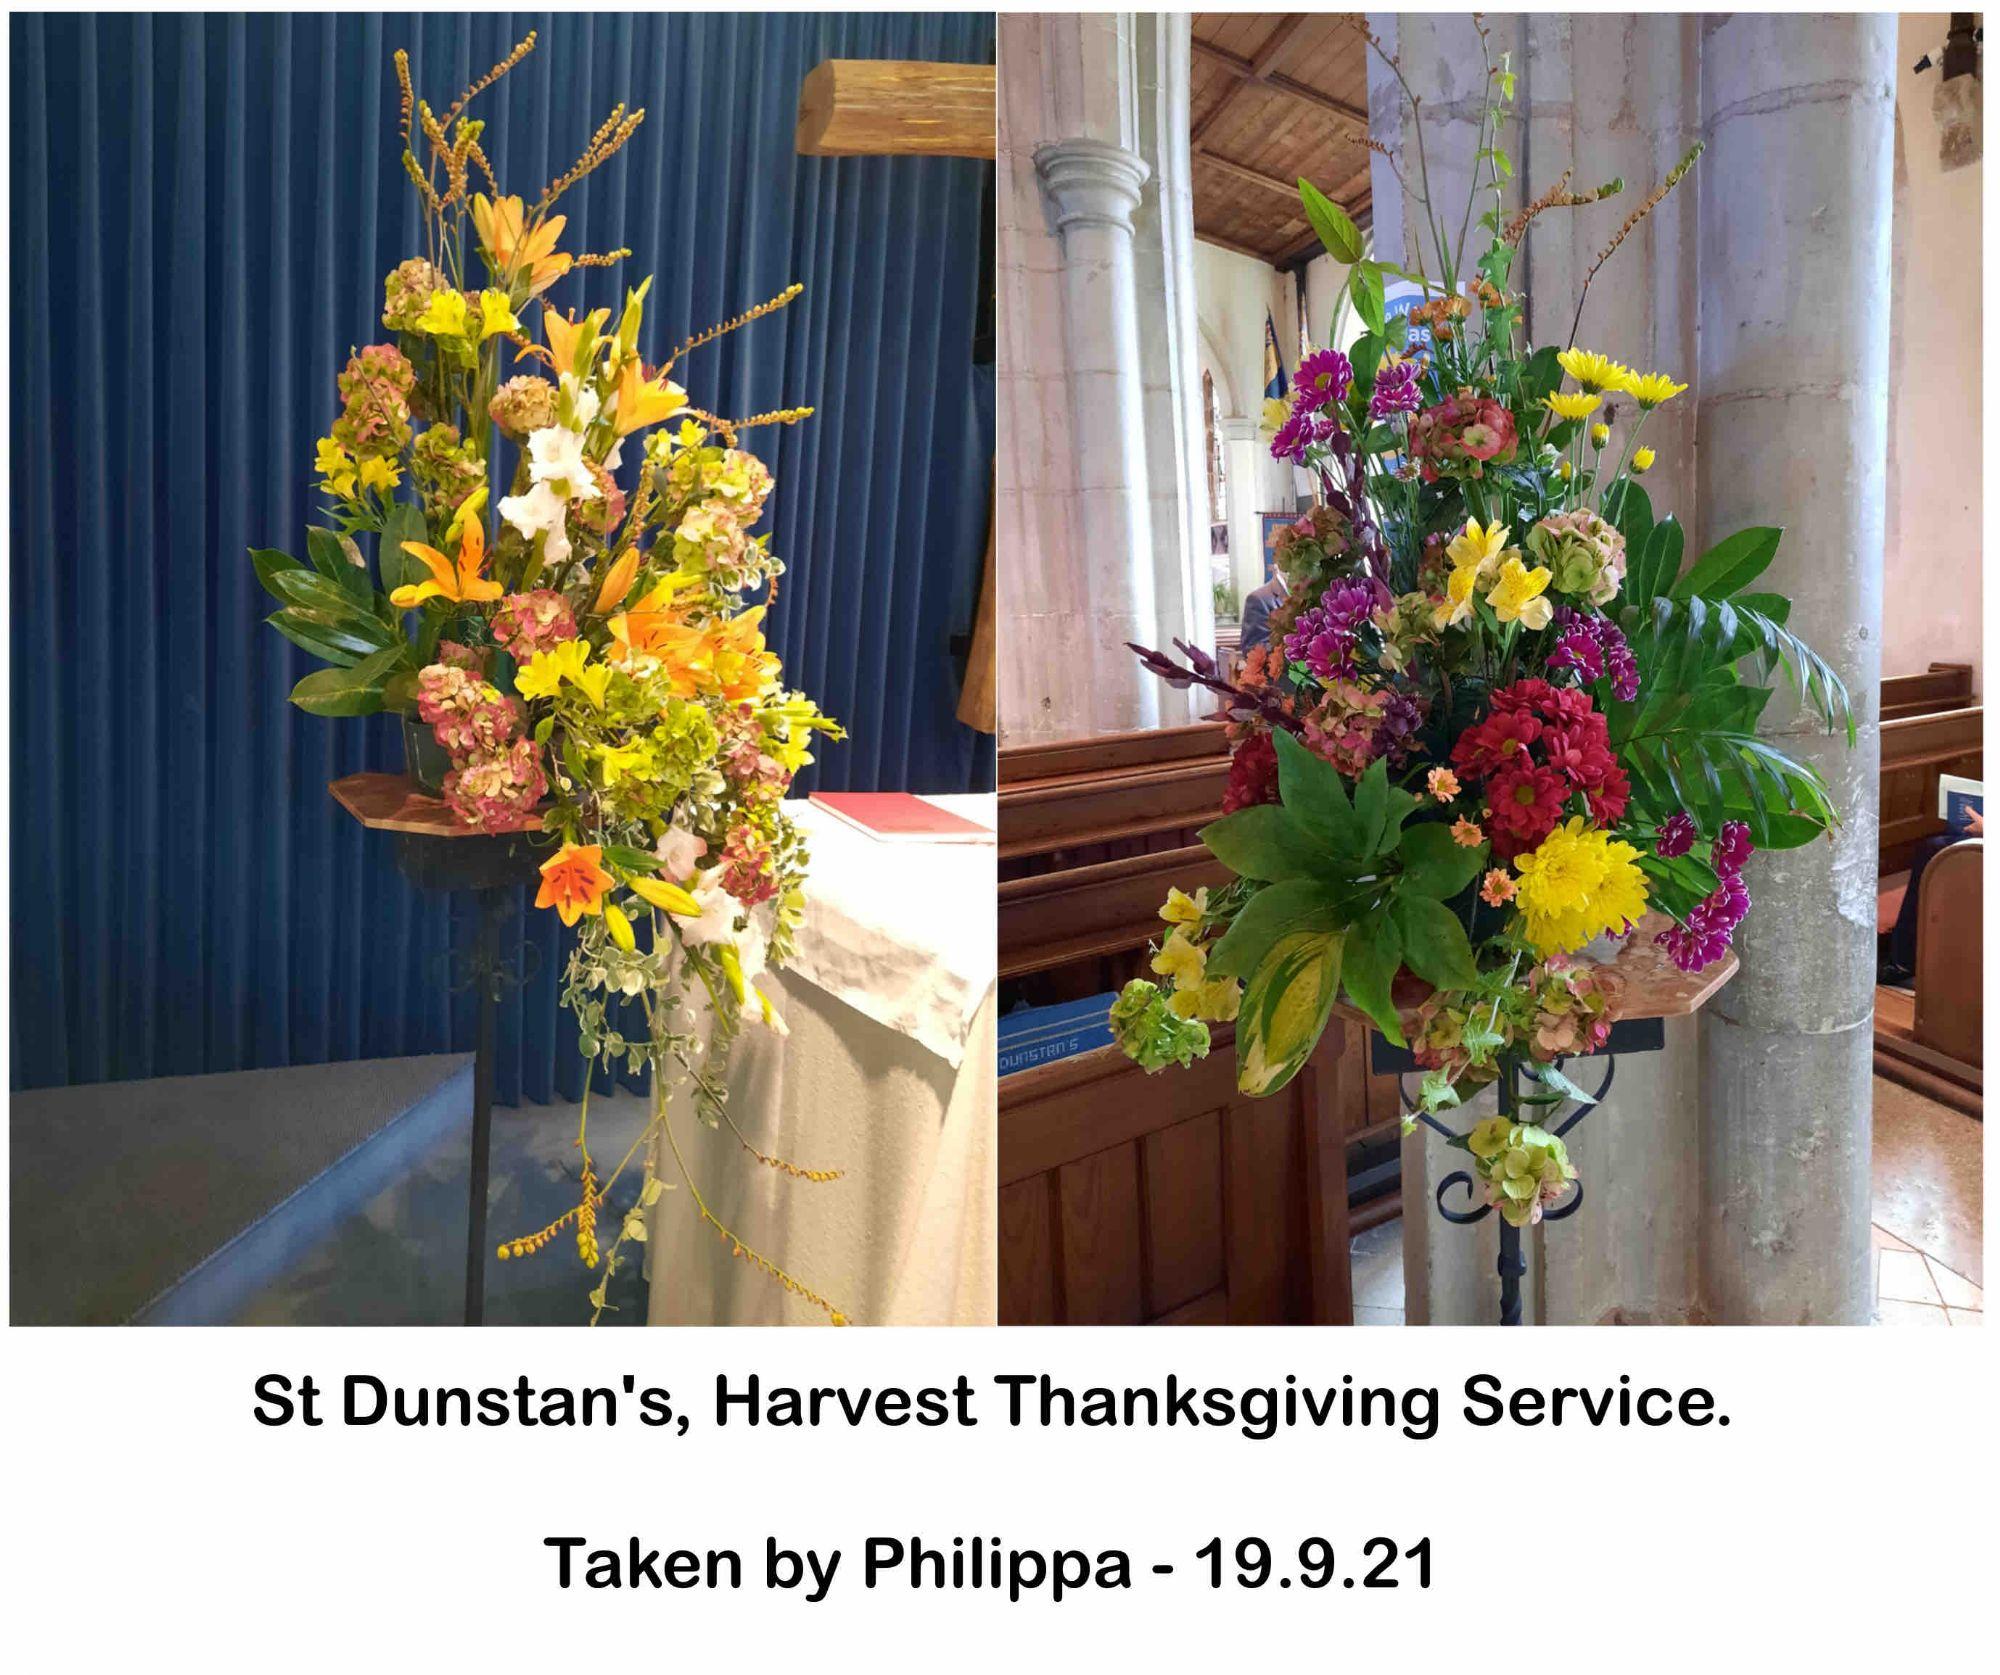 St Dunstan's, Harvest Thanksgiving Service(1)